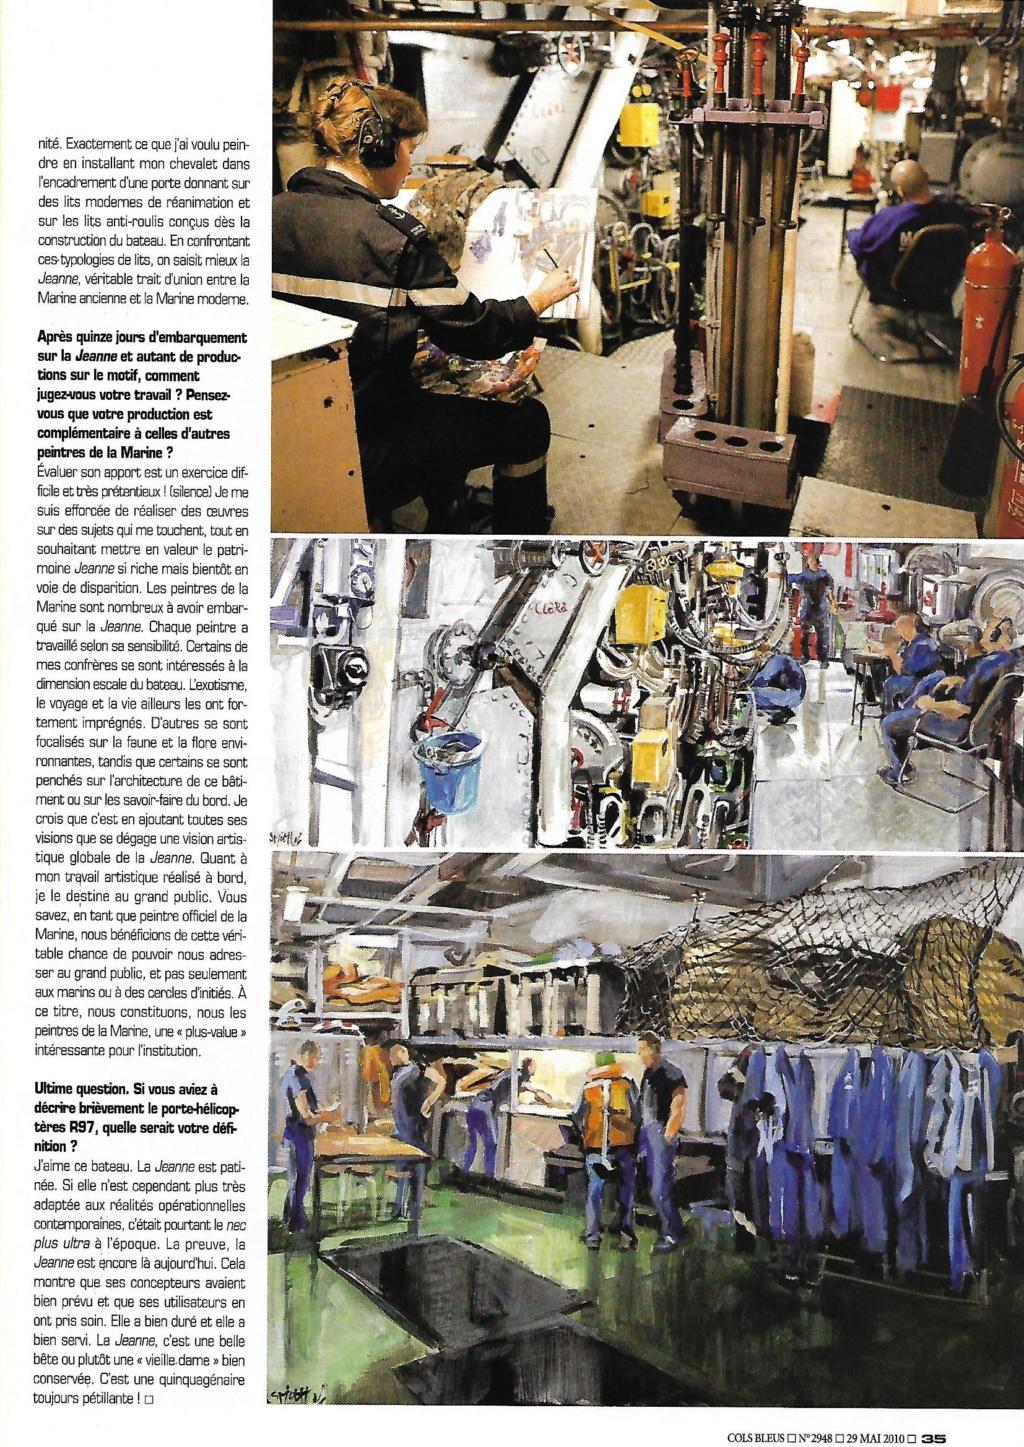 JEANNE D'ARC (PH) - VOLUME 4 - Page 22 Scan_143